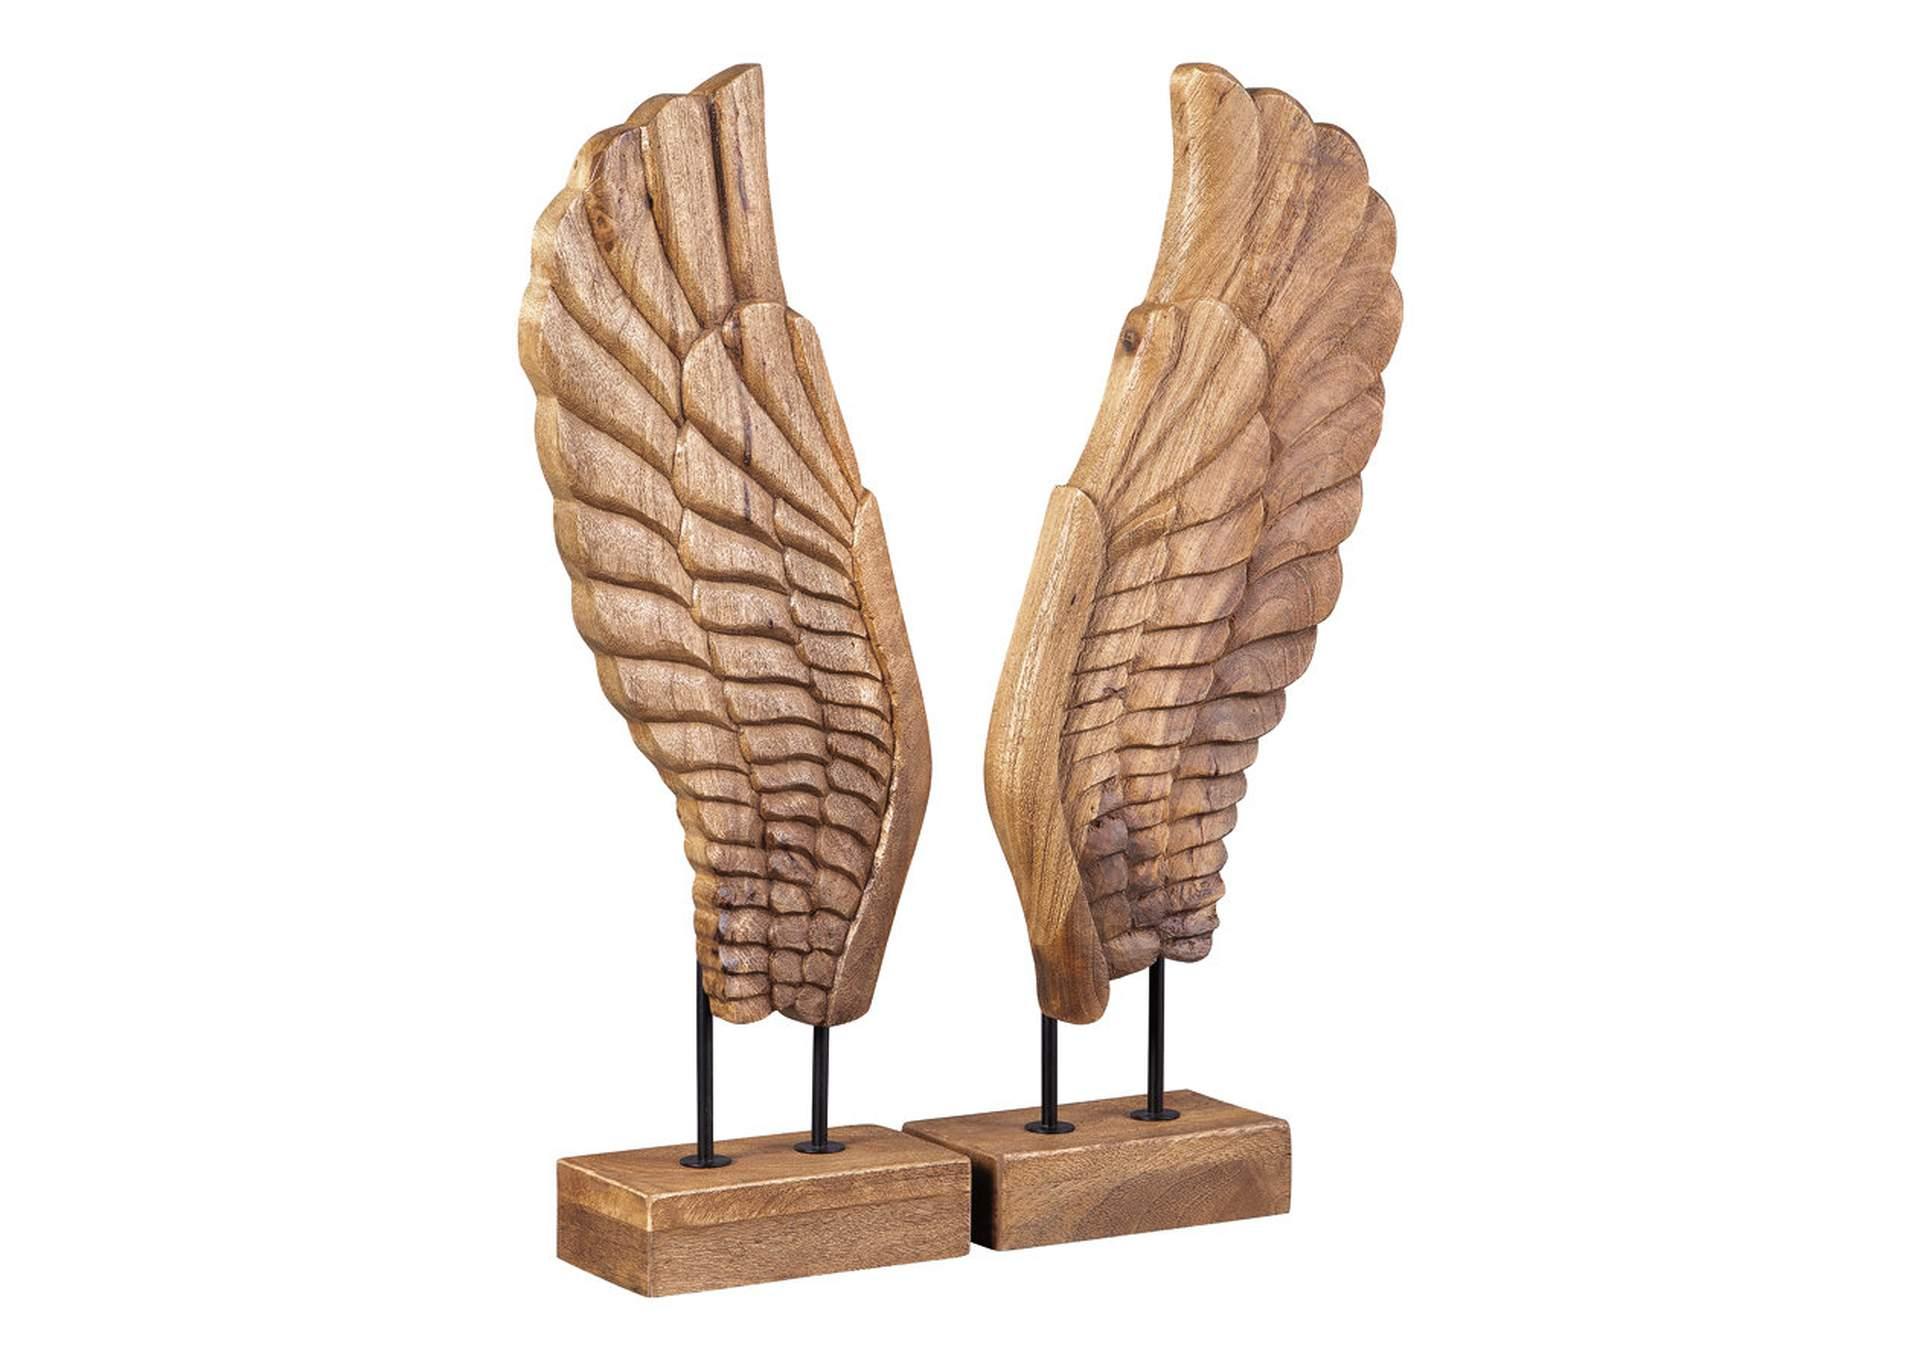 BRANDEN Natural Sculpture (Set of 2)